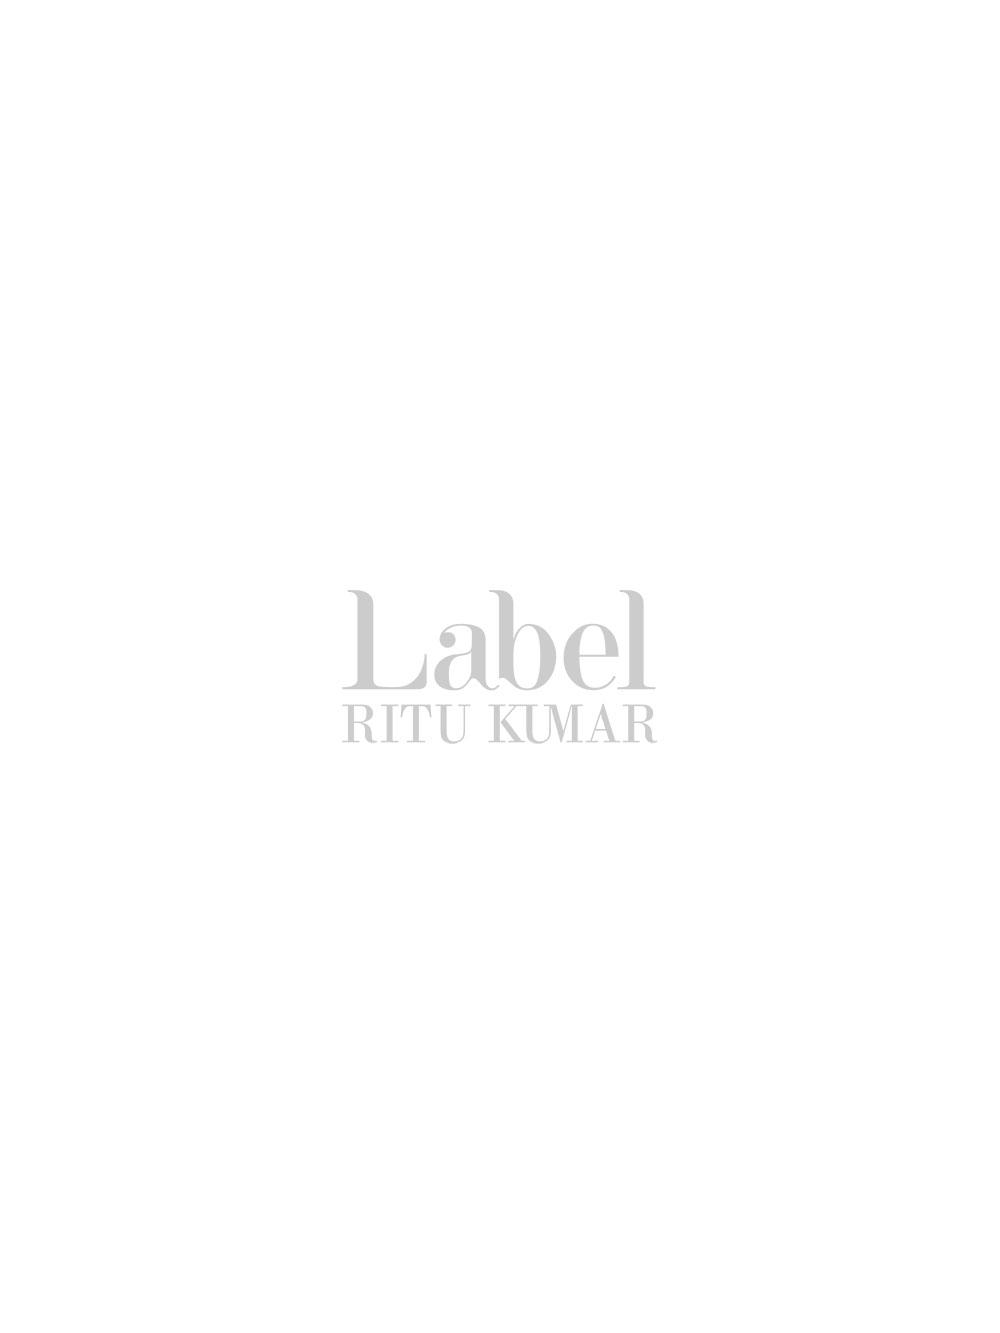 Red A-line Dress By Label Ritu Kumar